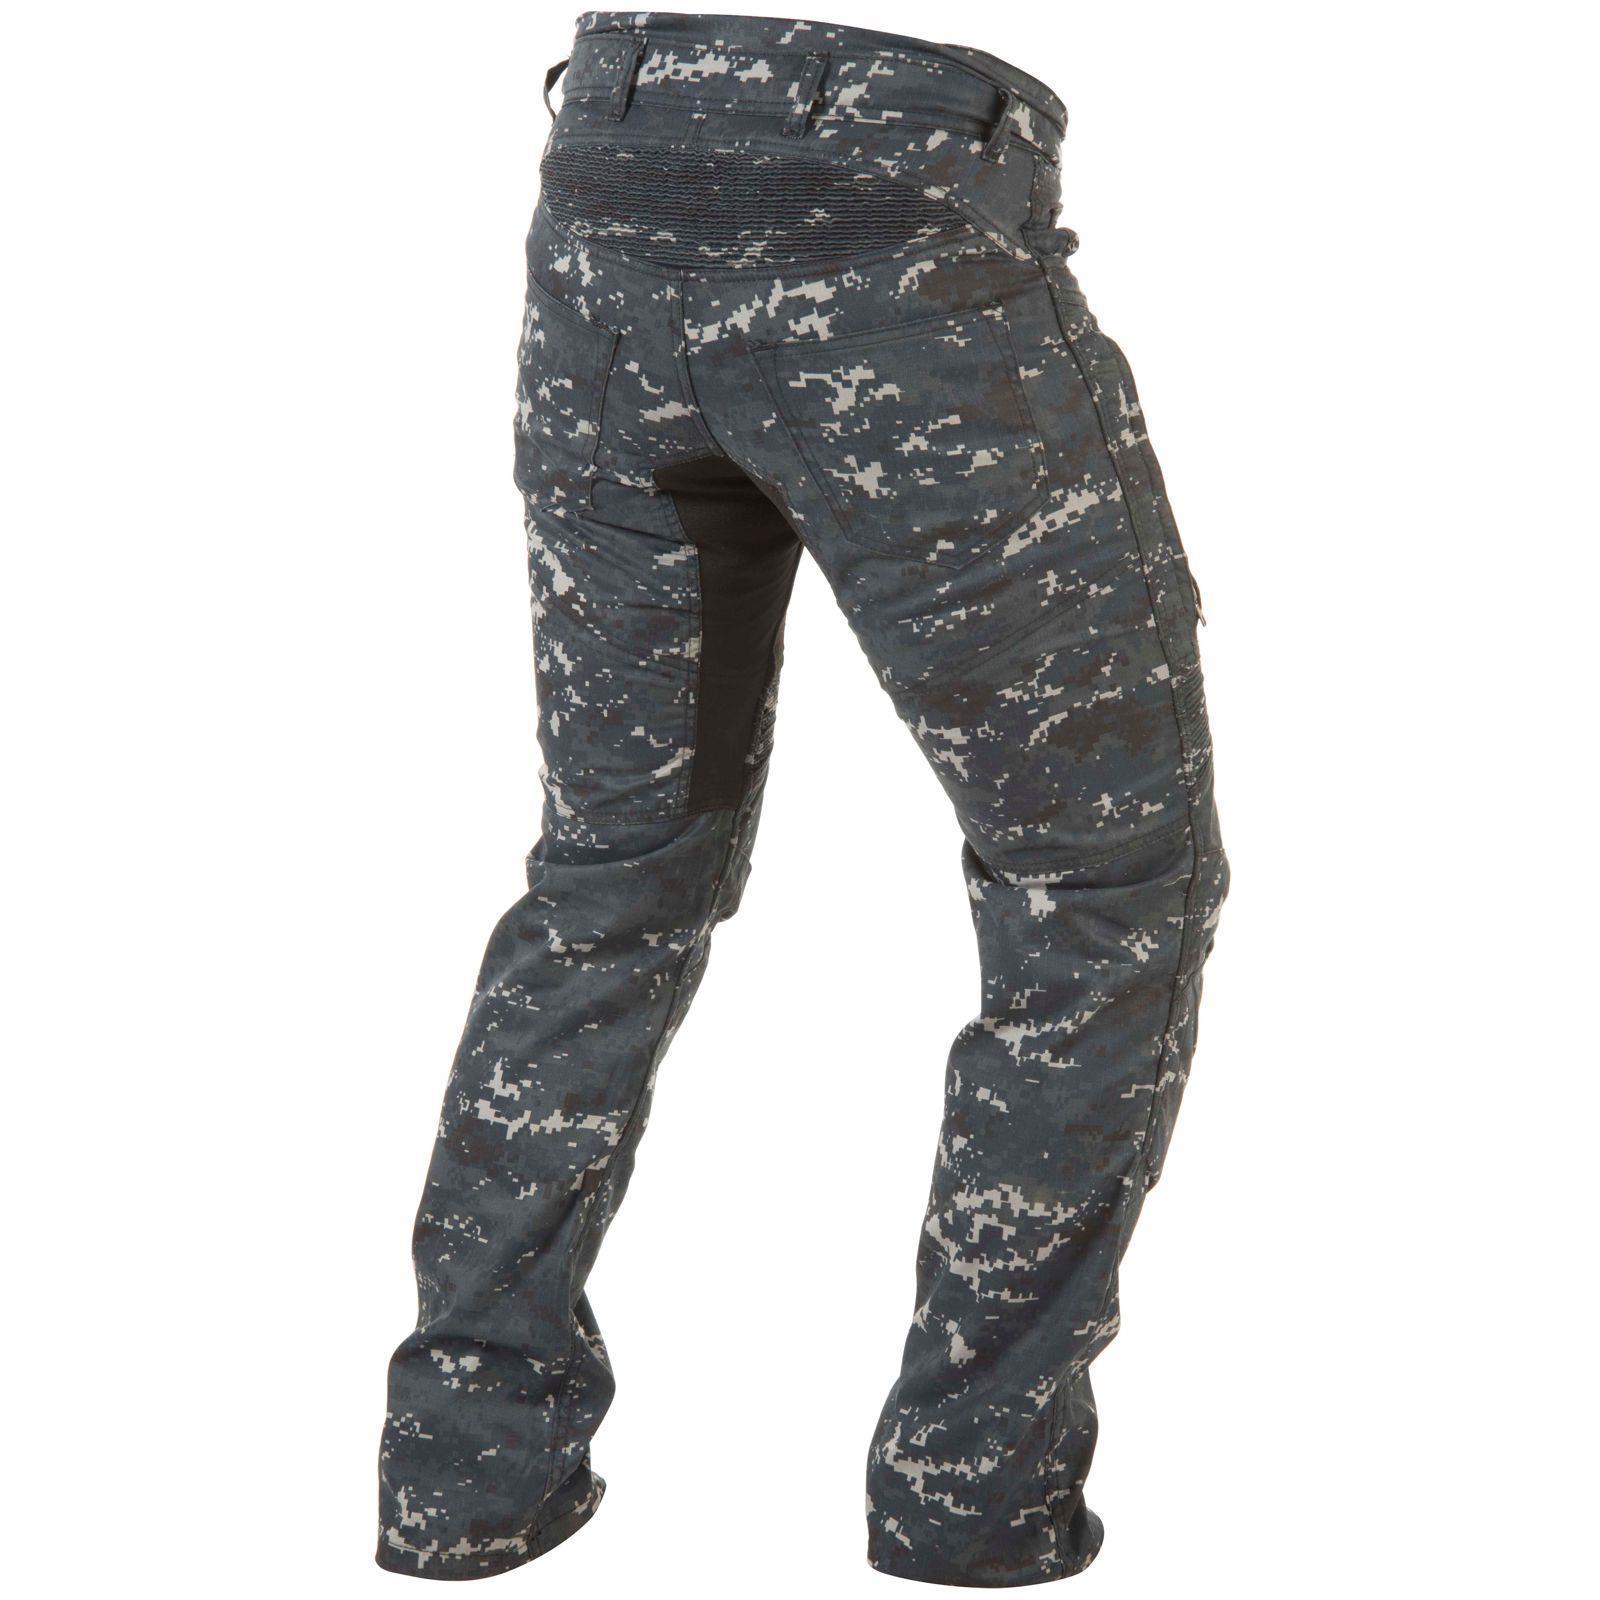 Trilobite-Pantaloni-Moto-Jeans-Abbigliamento-Parado-MICAS-URBAN-DUAL-PANTS-ACID miniatura 52